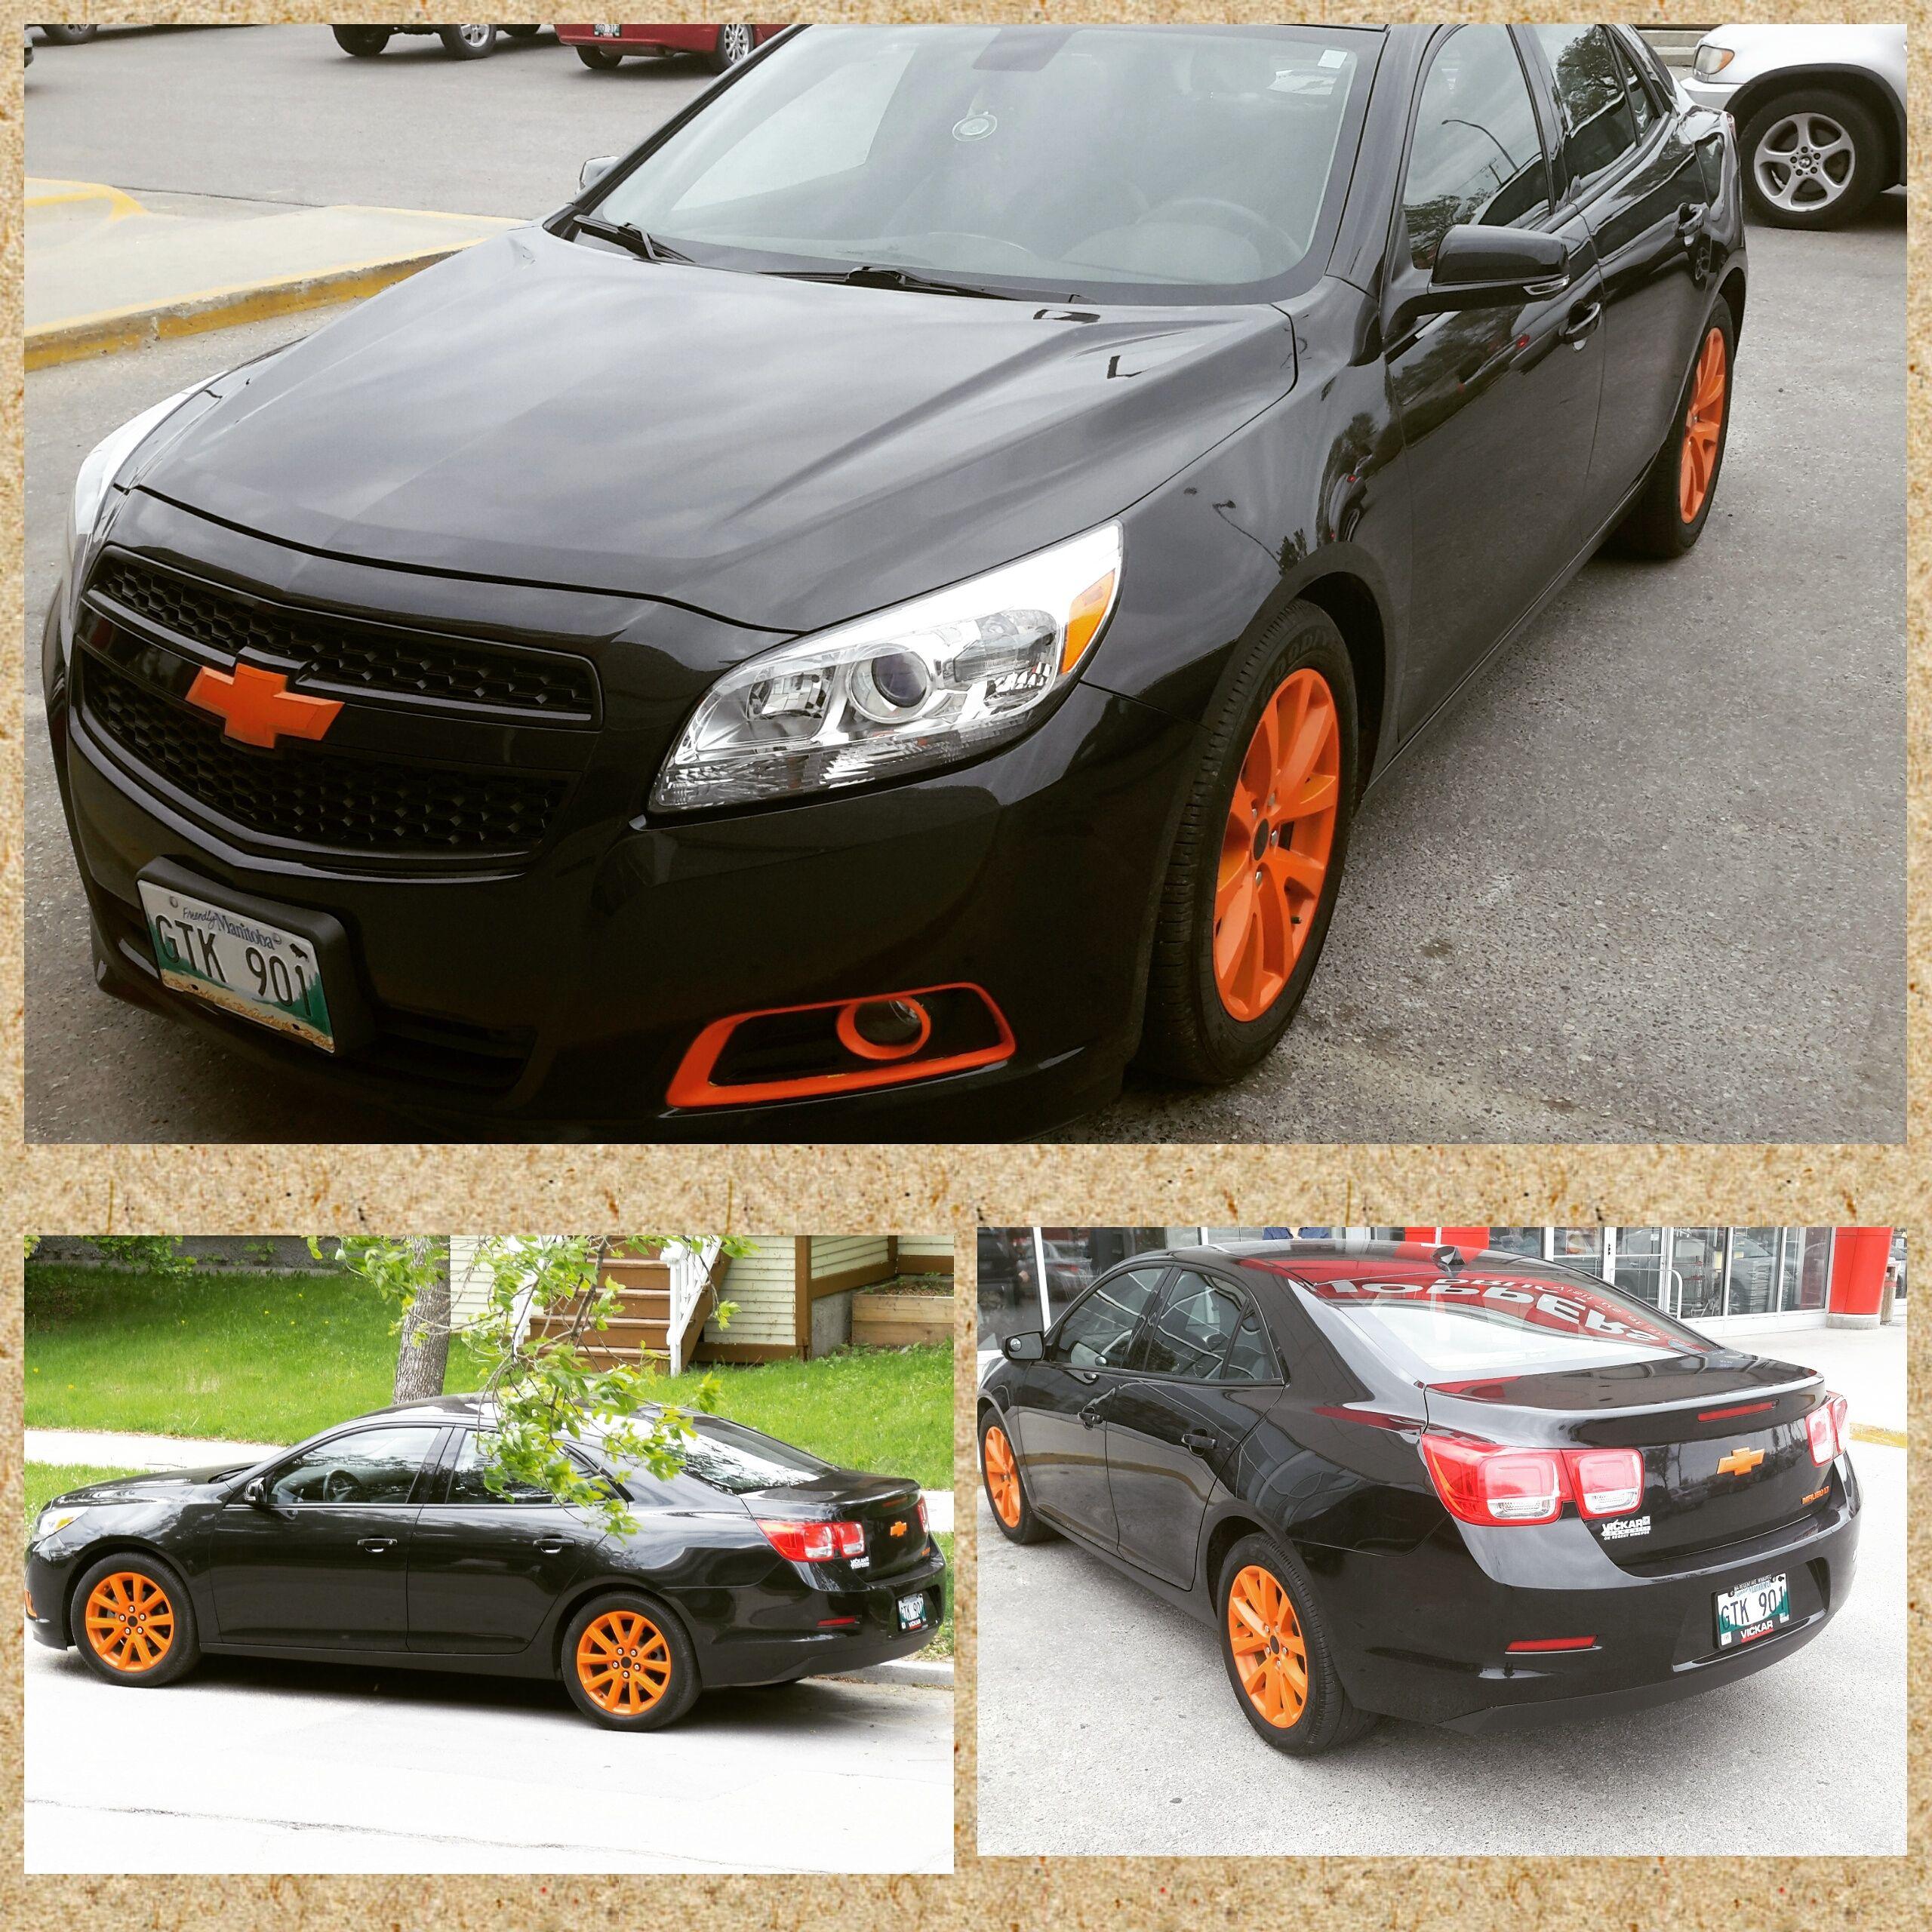 My 2013 chevy malibu plasti dipped black trims and tangerine orange full spectrum wheels